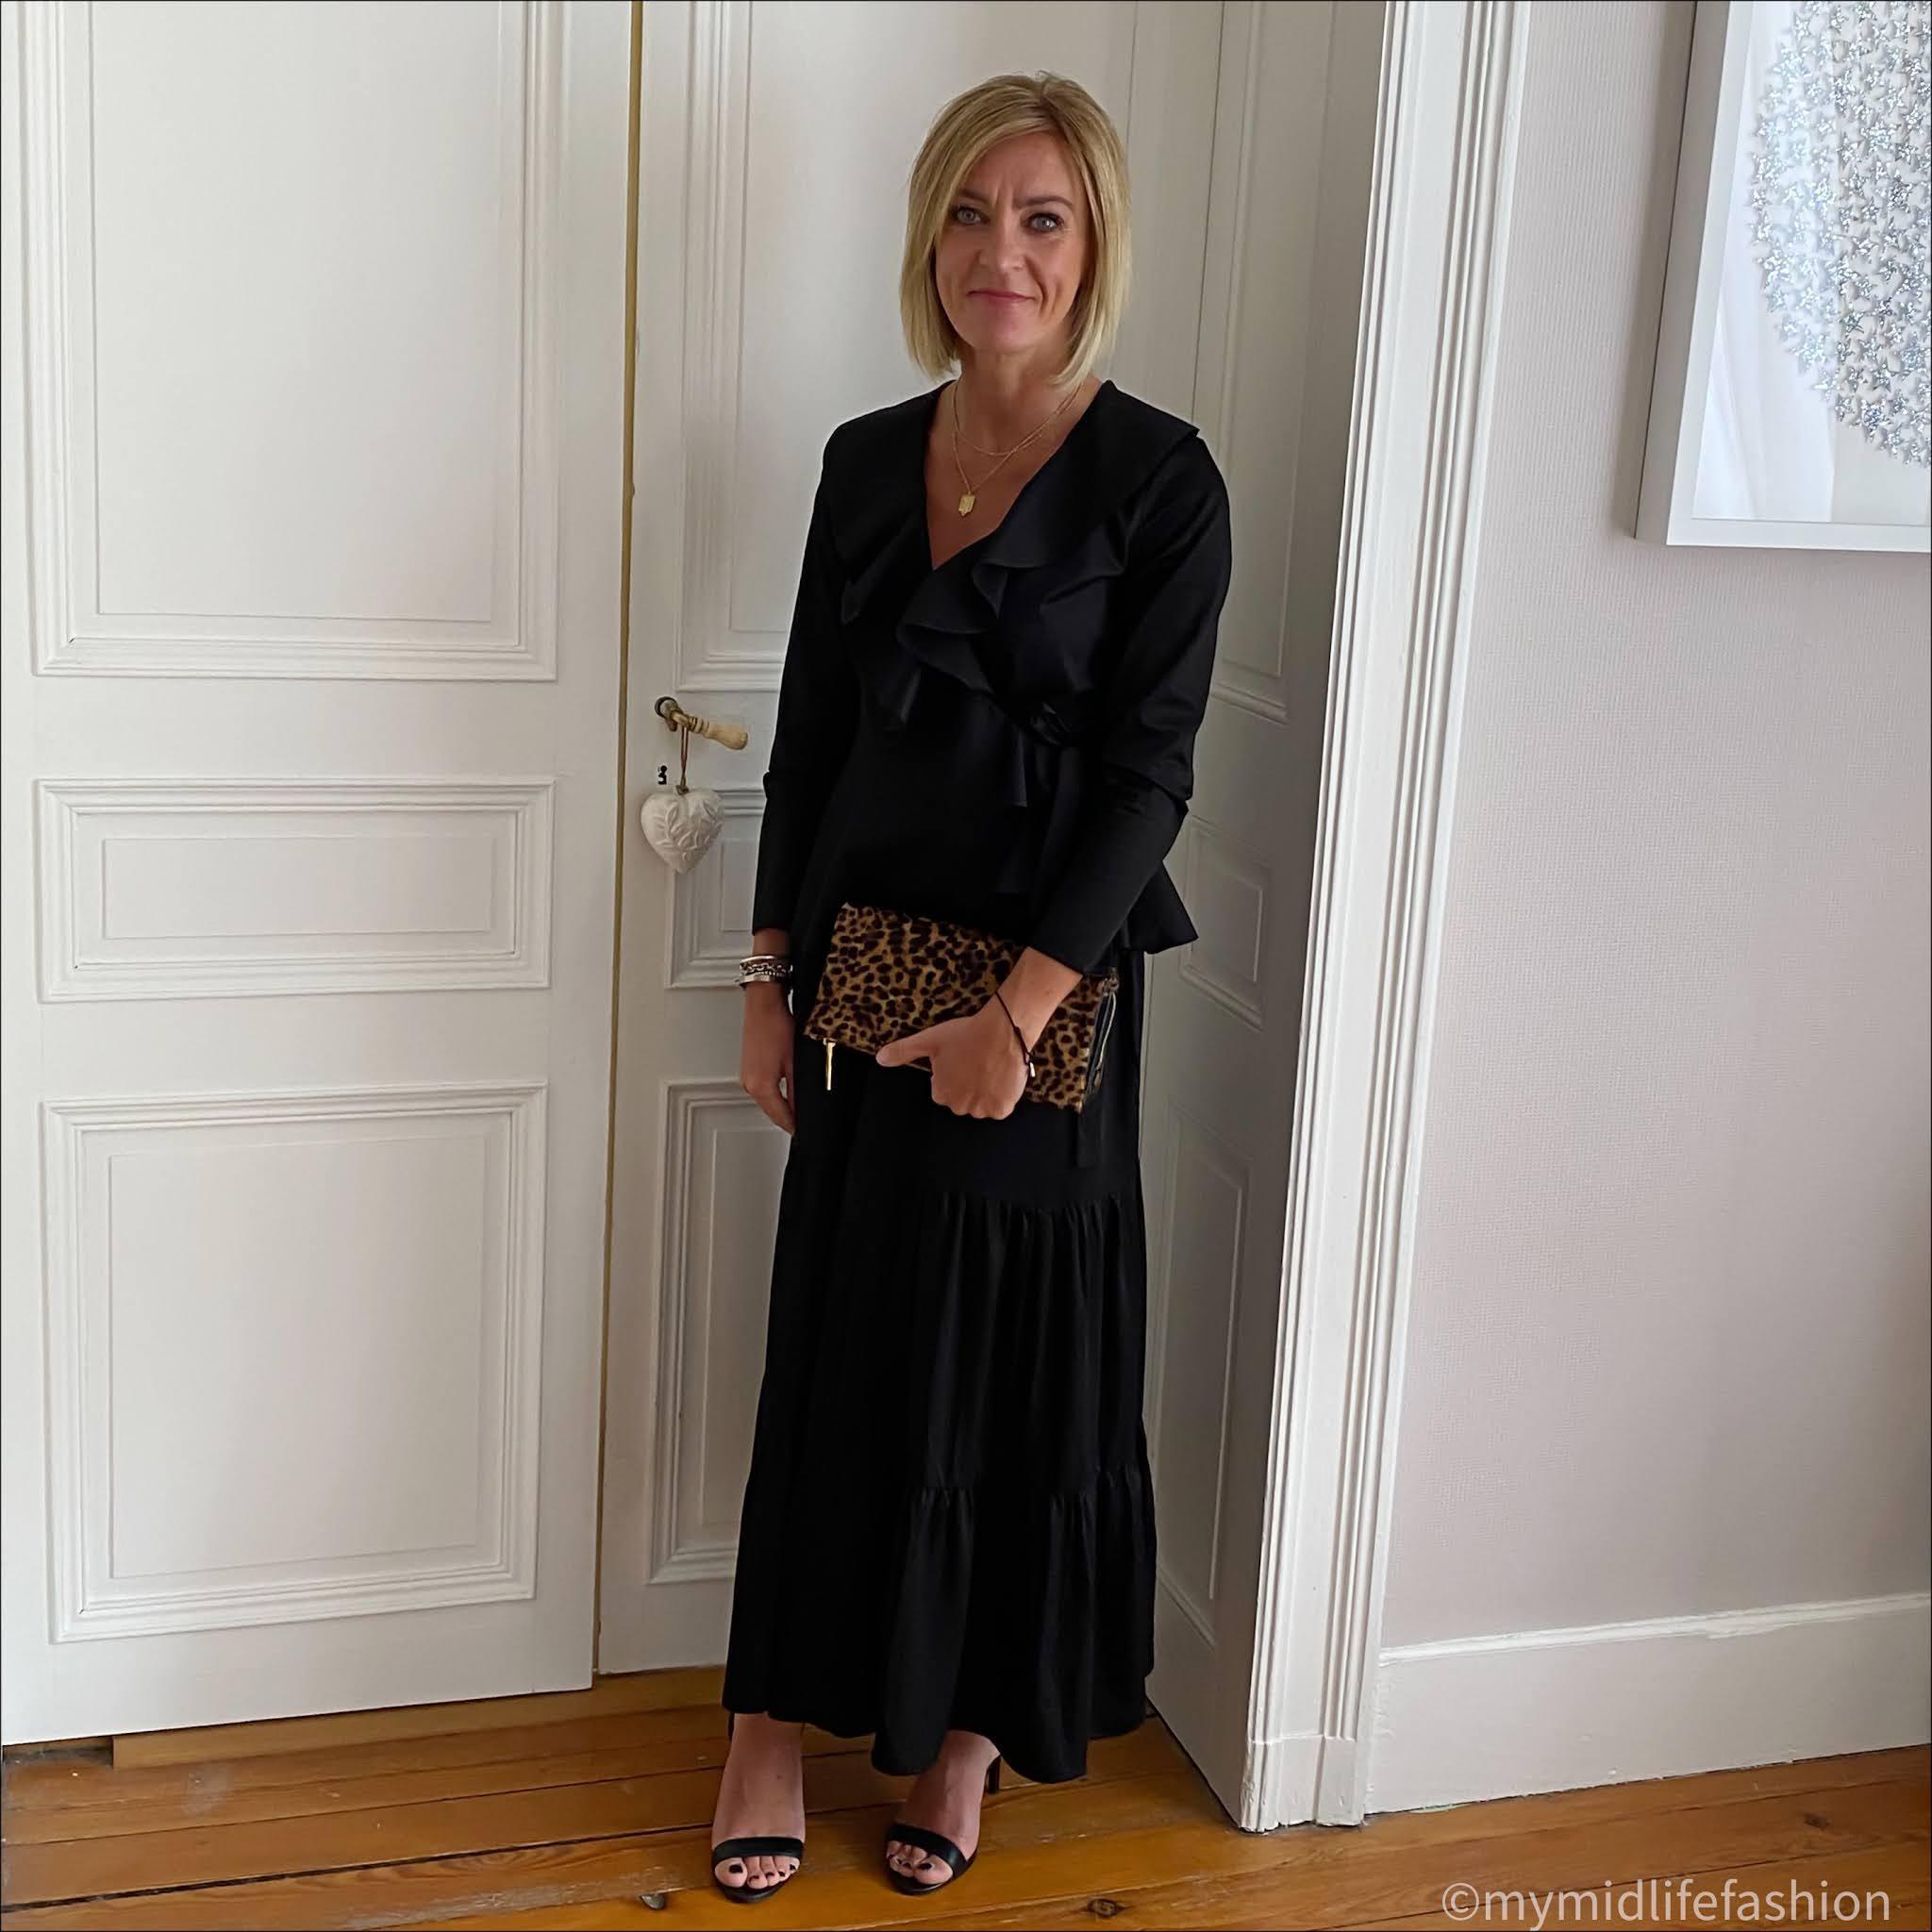 my midlife fashion, saint and Sofia greenwich skirt, saint and Sofia ruffle blouse